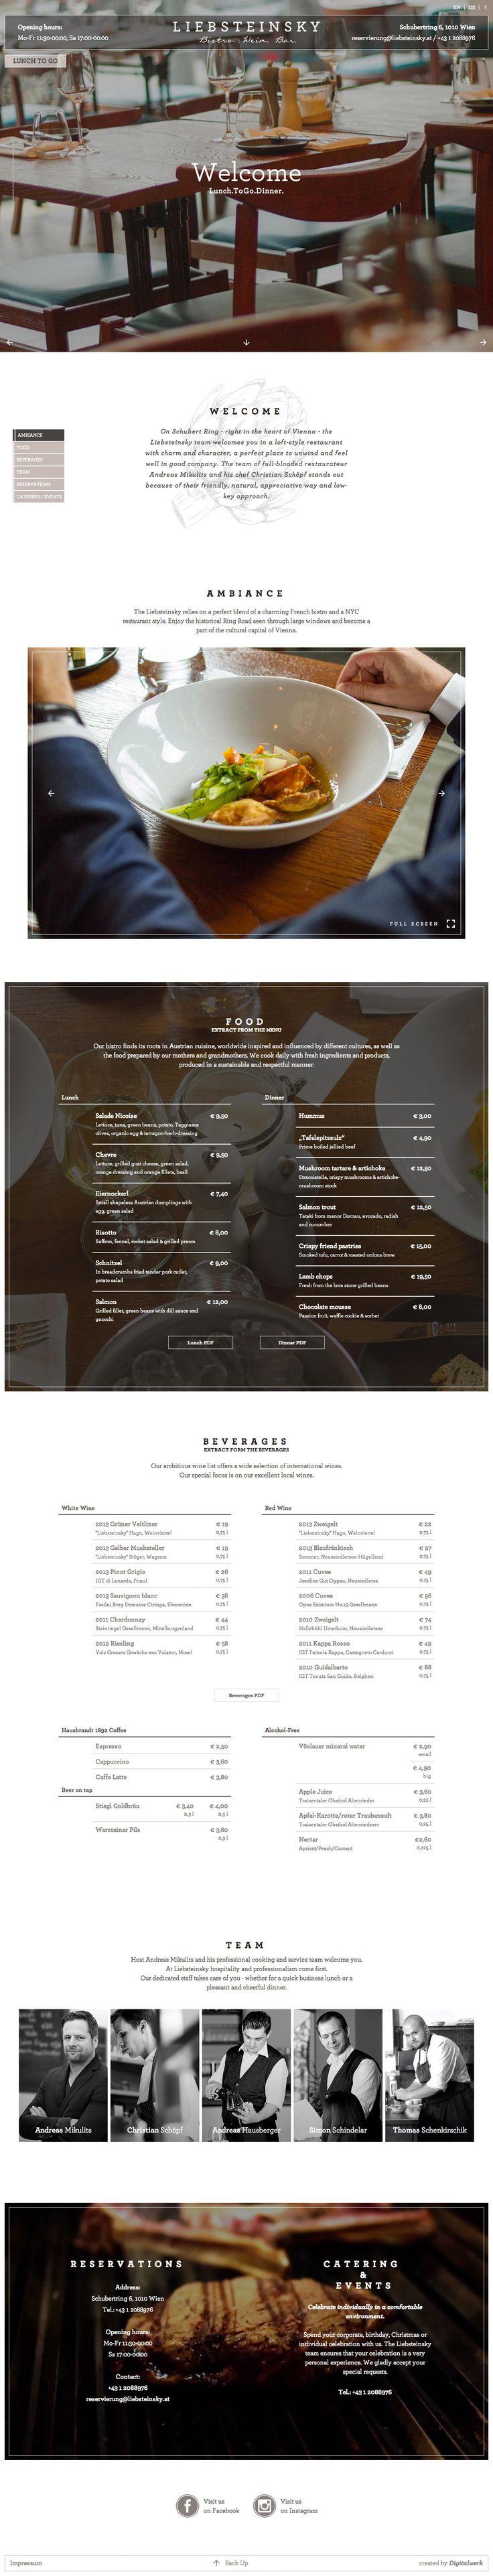 70 best homepage designs images on pinterest | website designs